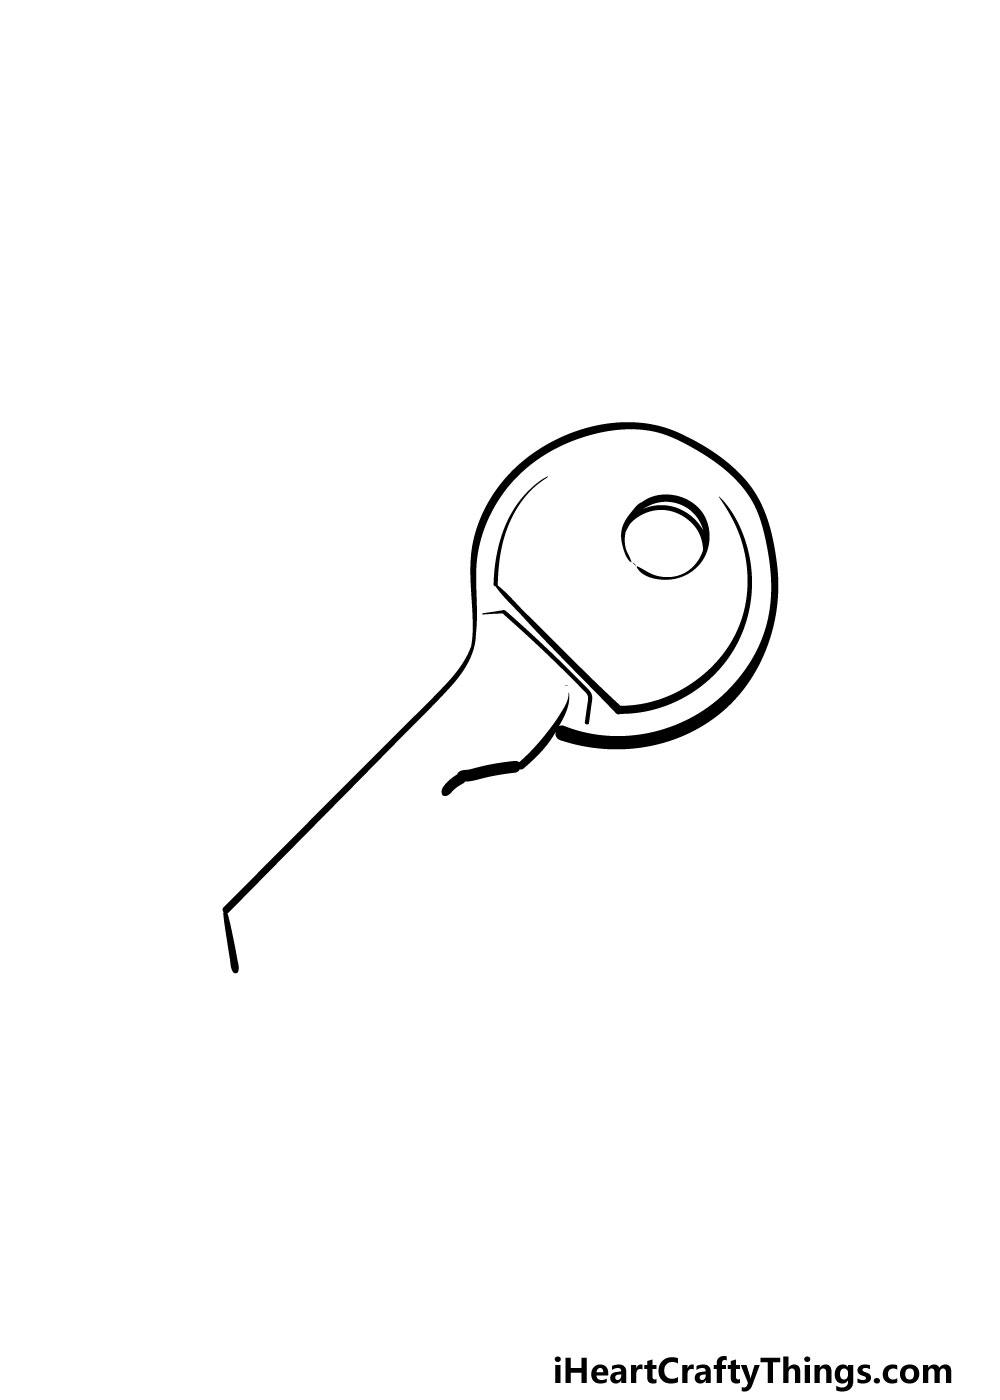 drawing a key step 3